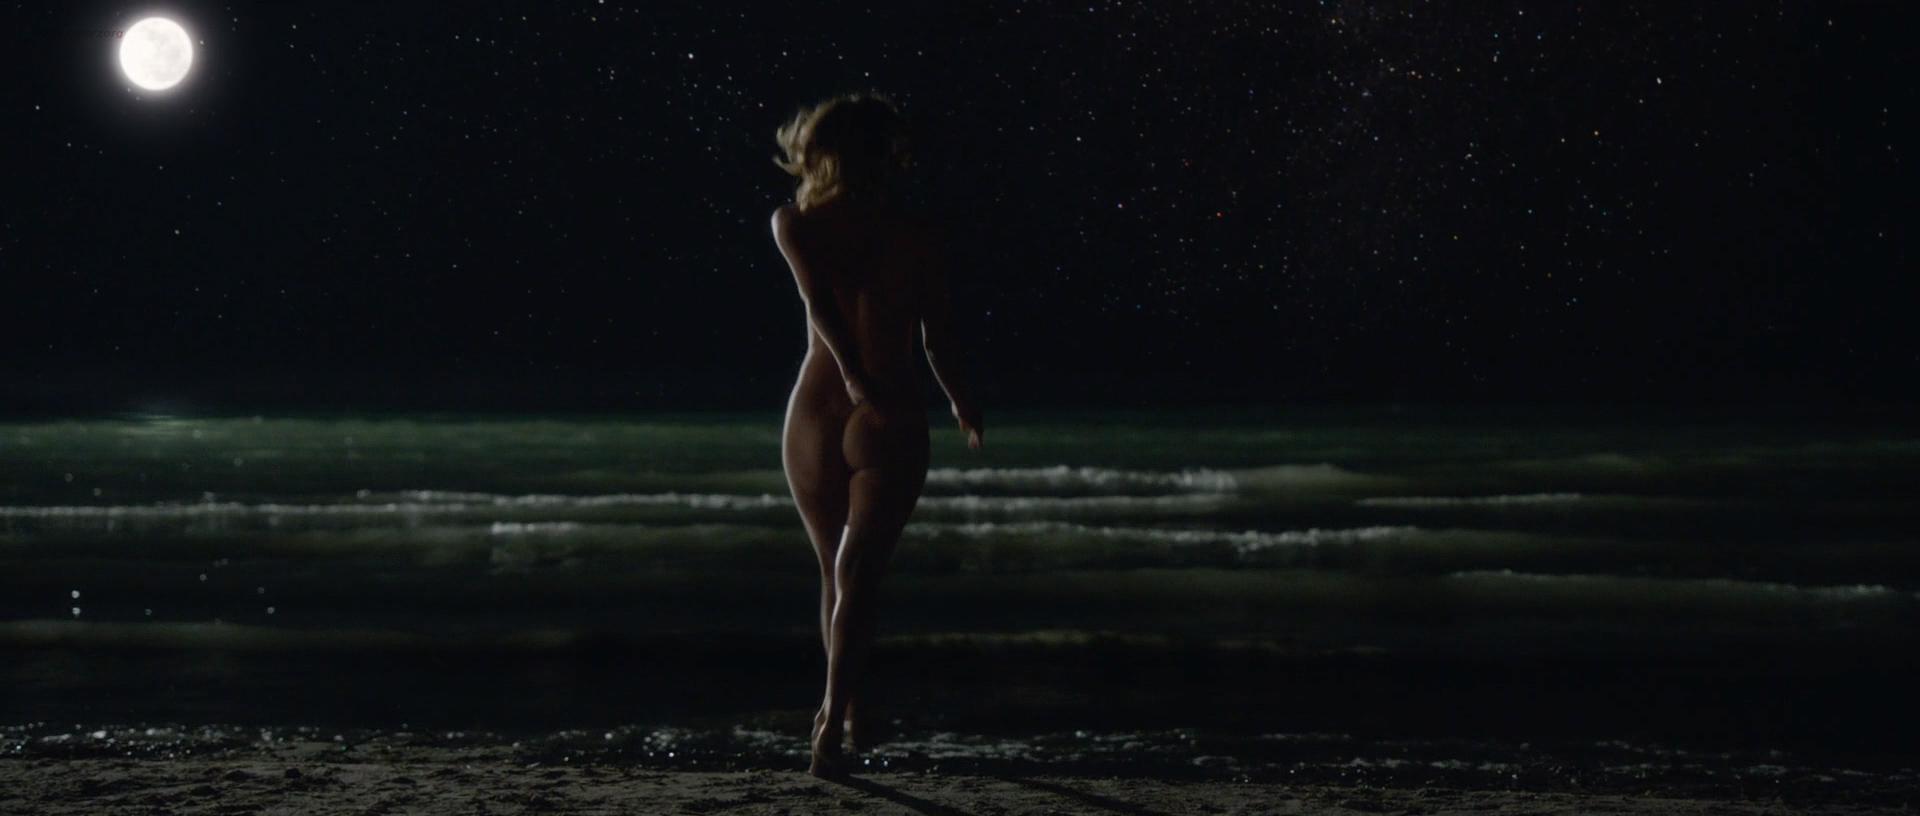 Nude pics of zoe kazan remarkable, valuable